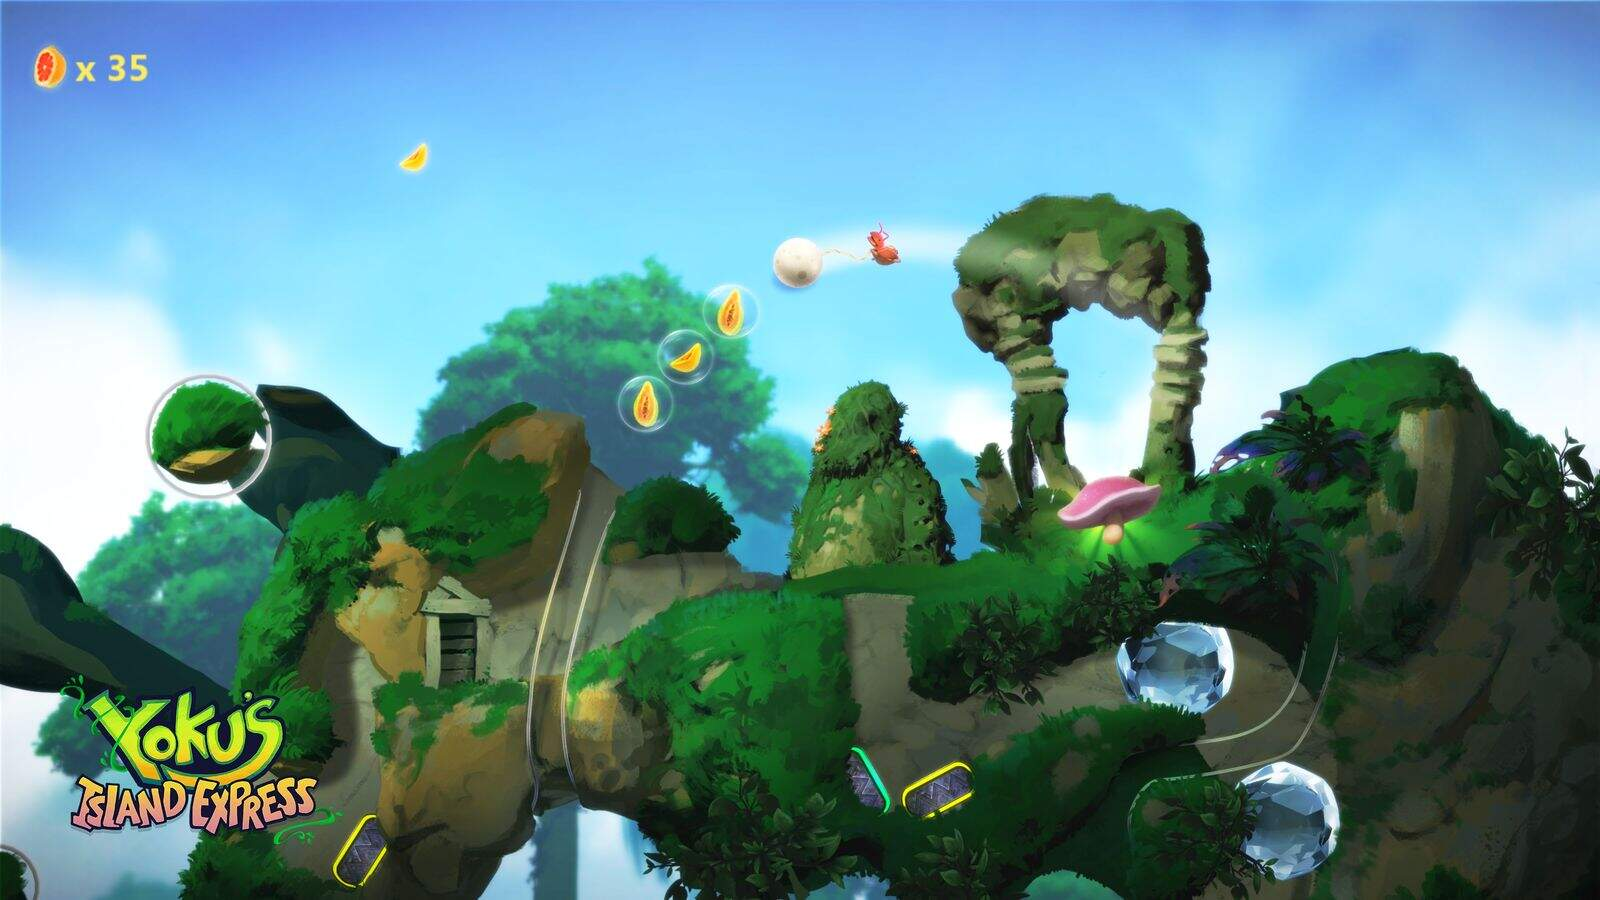 Yoku's Island Express Screenshot 01